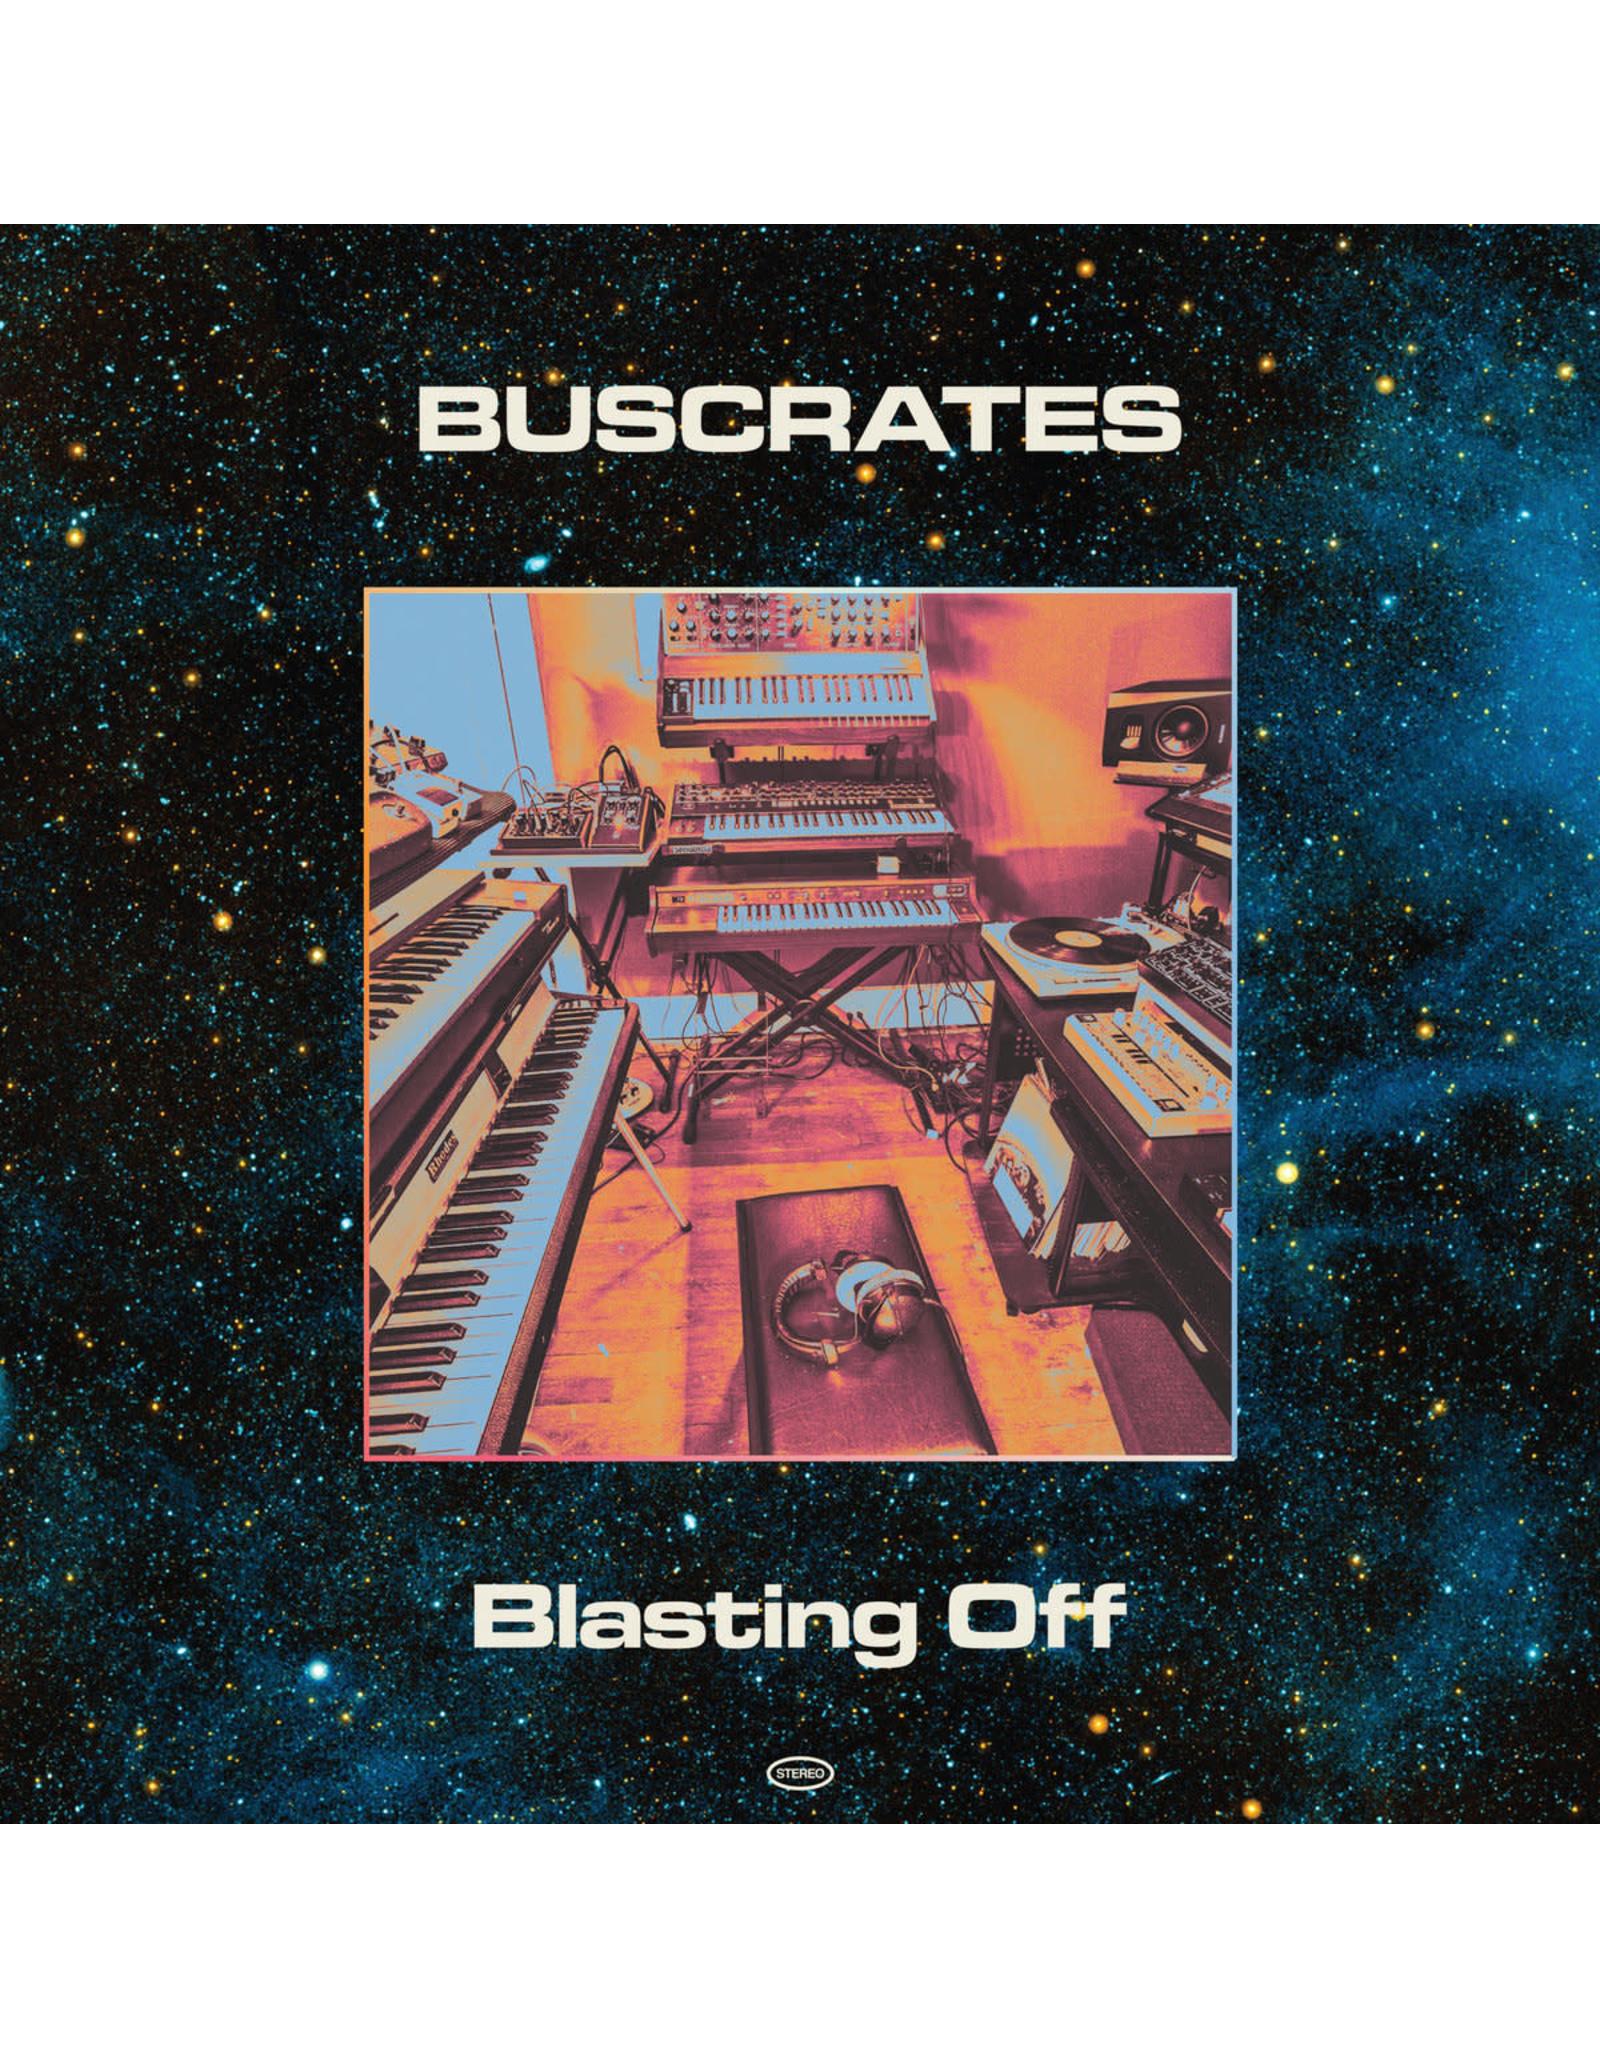 New Vinyl Buscrates - Blastin Off LP